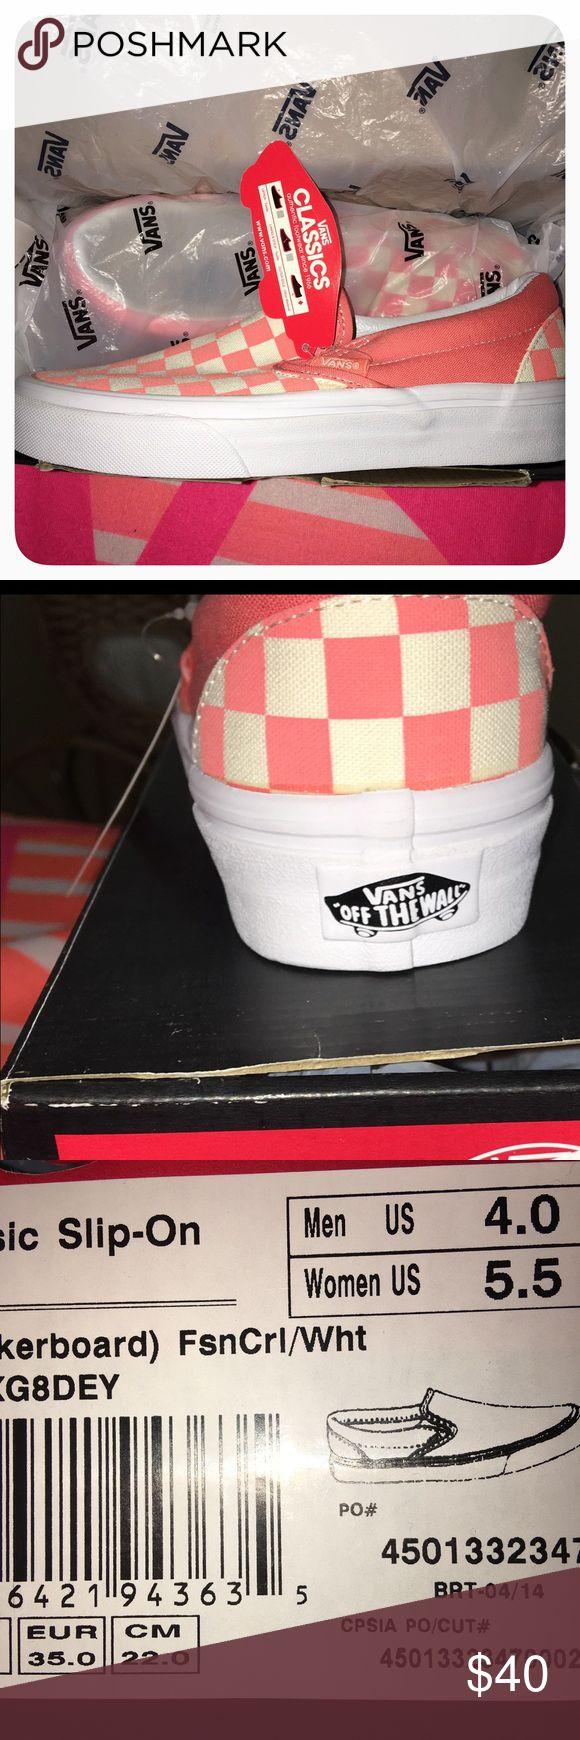 🎁🆕In Box Vans Classic Slip On Checkerboard Print 🆕In box Vans Checkerboard Slip On Sneakers Men's size 4 Women's size 5.5 Vans Shoes Sneakers